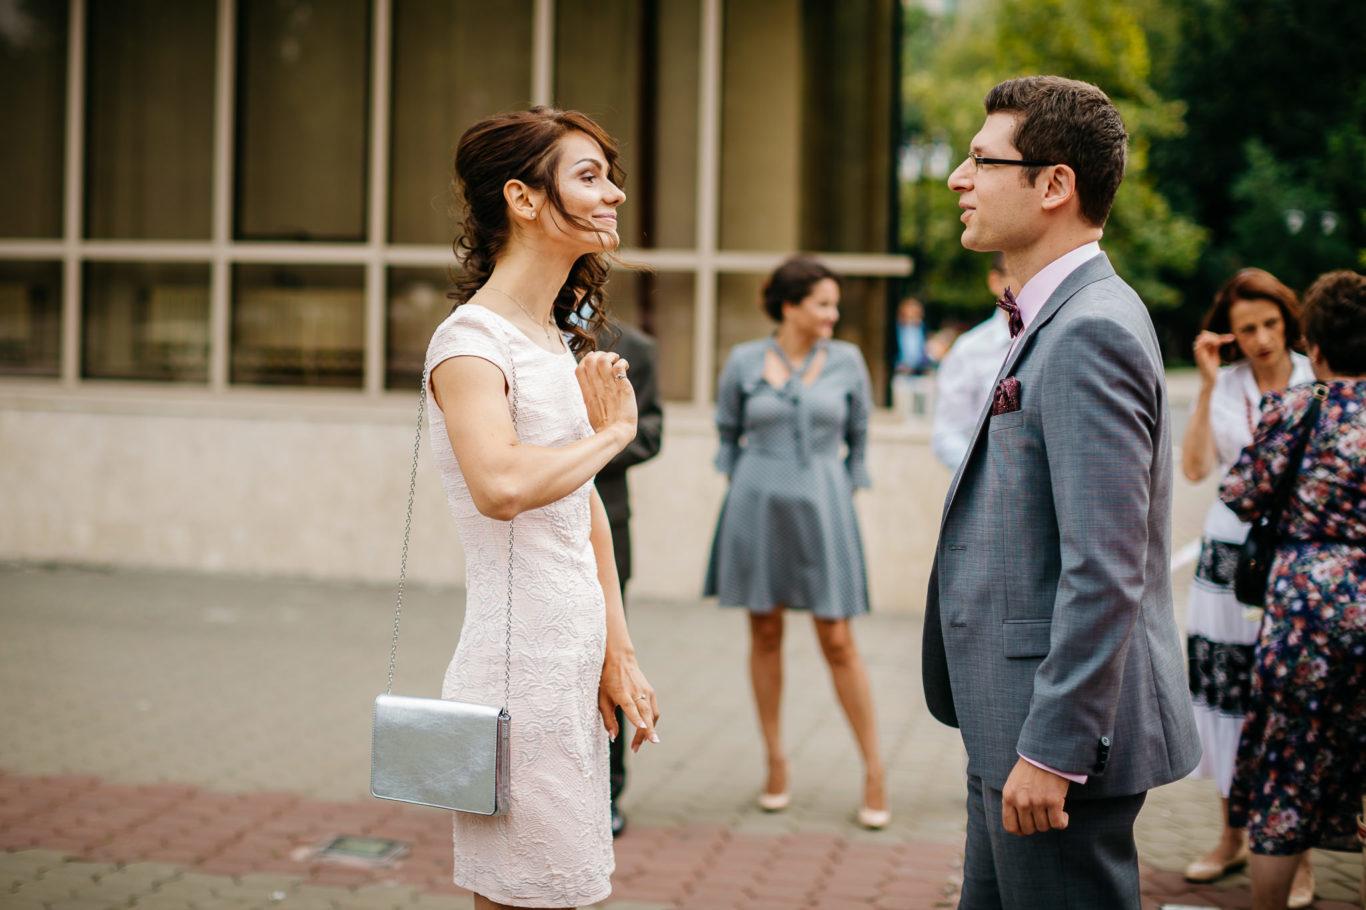 0019-fotografie-nunta-bucuresti-dana-radu-fotograf-ciprian-dumitrescu-cd2_6030